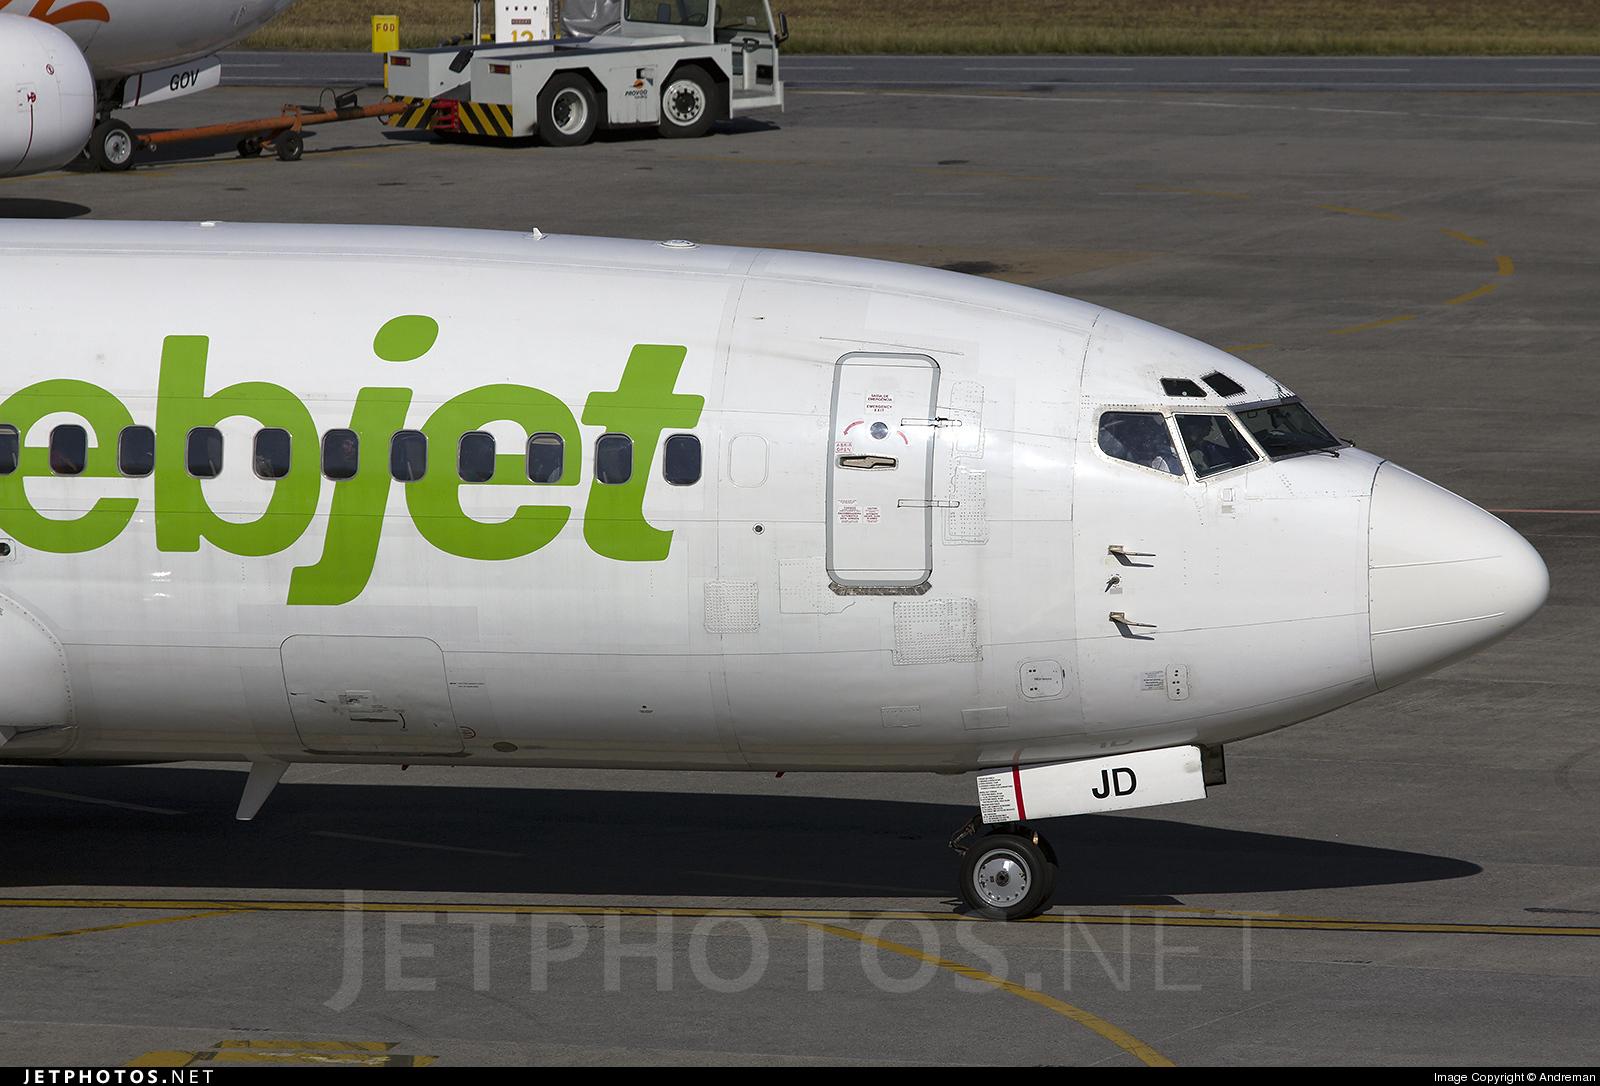 Photo of PR-WJD Boeing 737-3Y0 by André Advíncula Osório